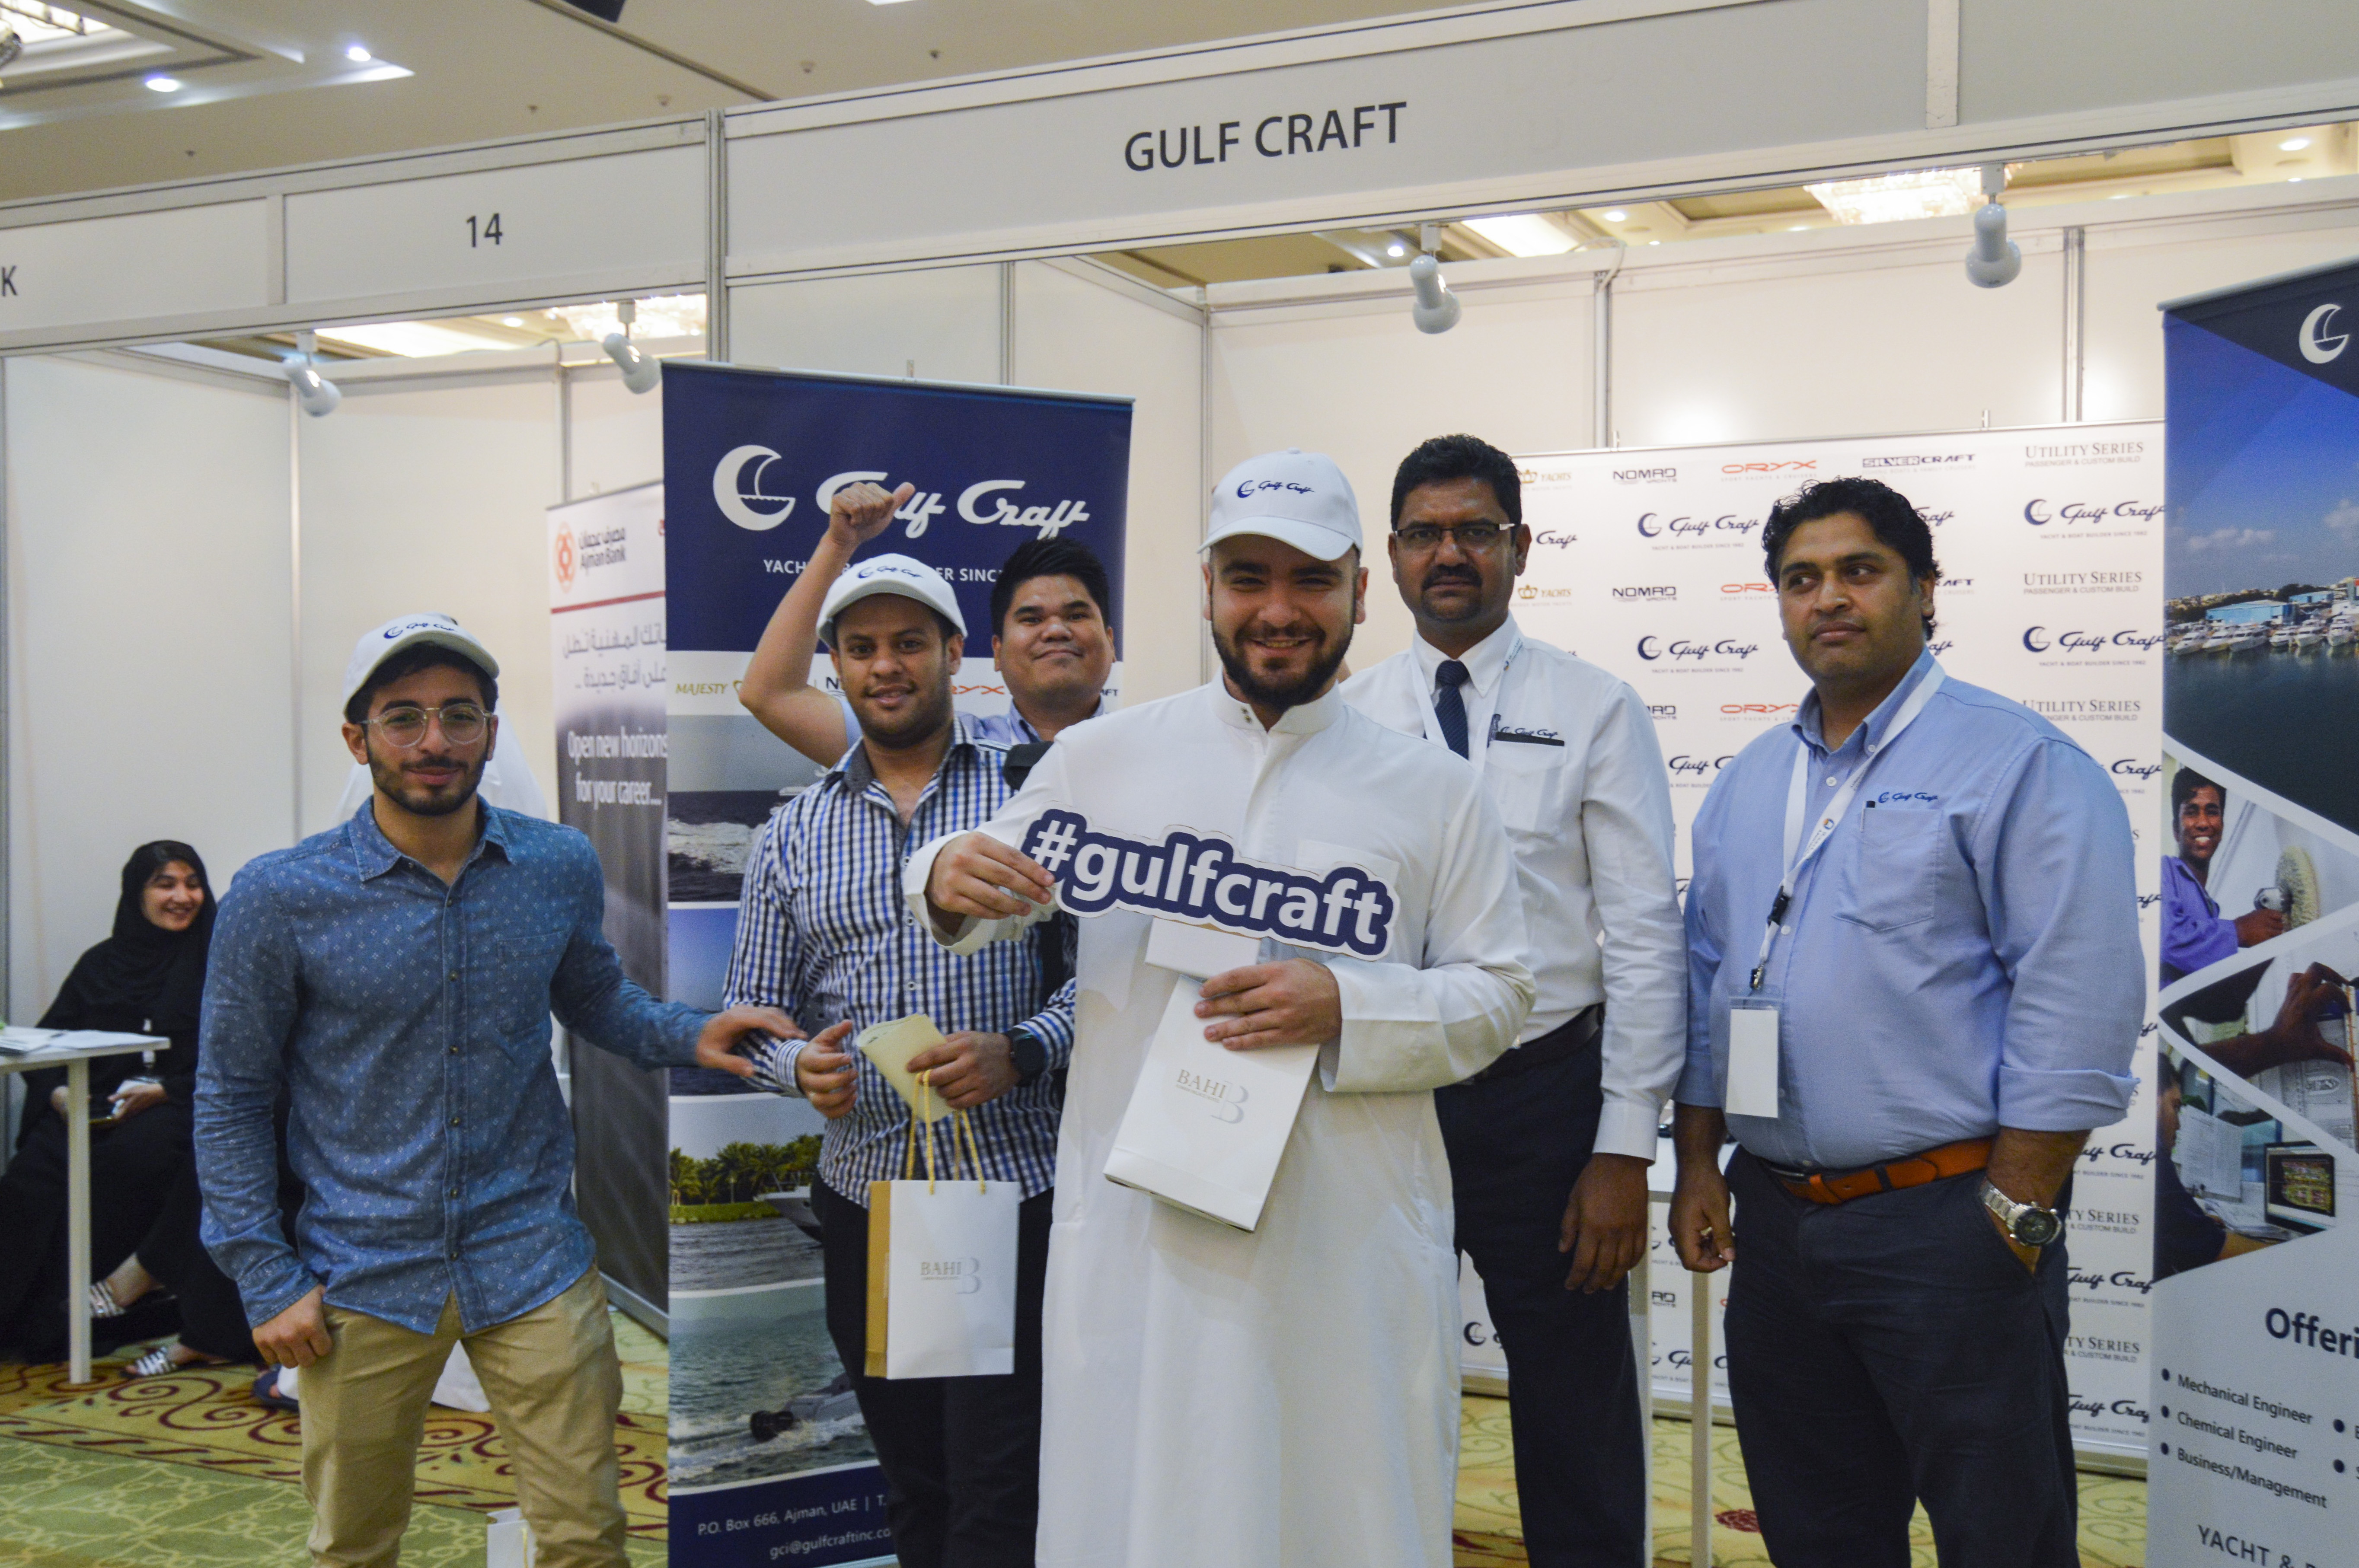 Gulf Craft at Ajman University Job Fair 2018 (8).jpg